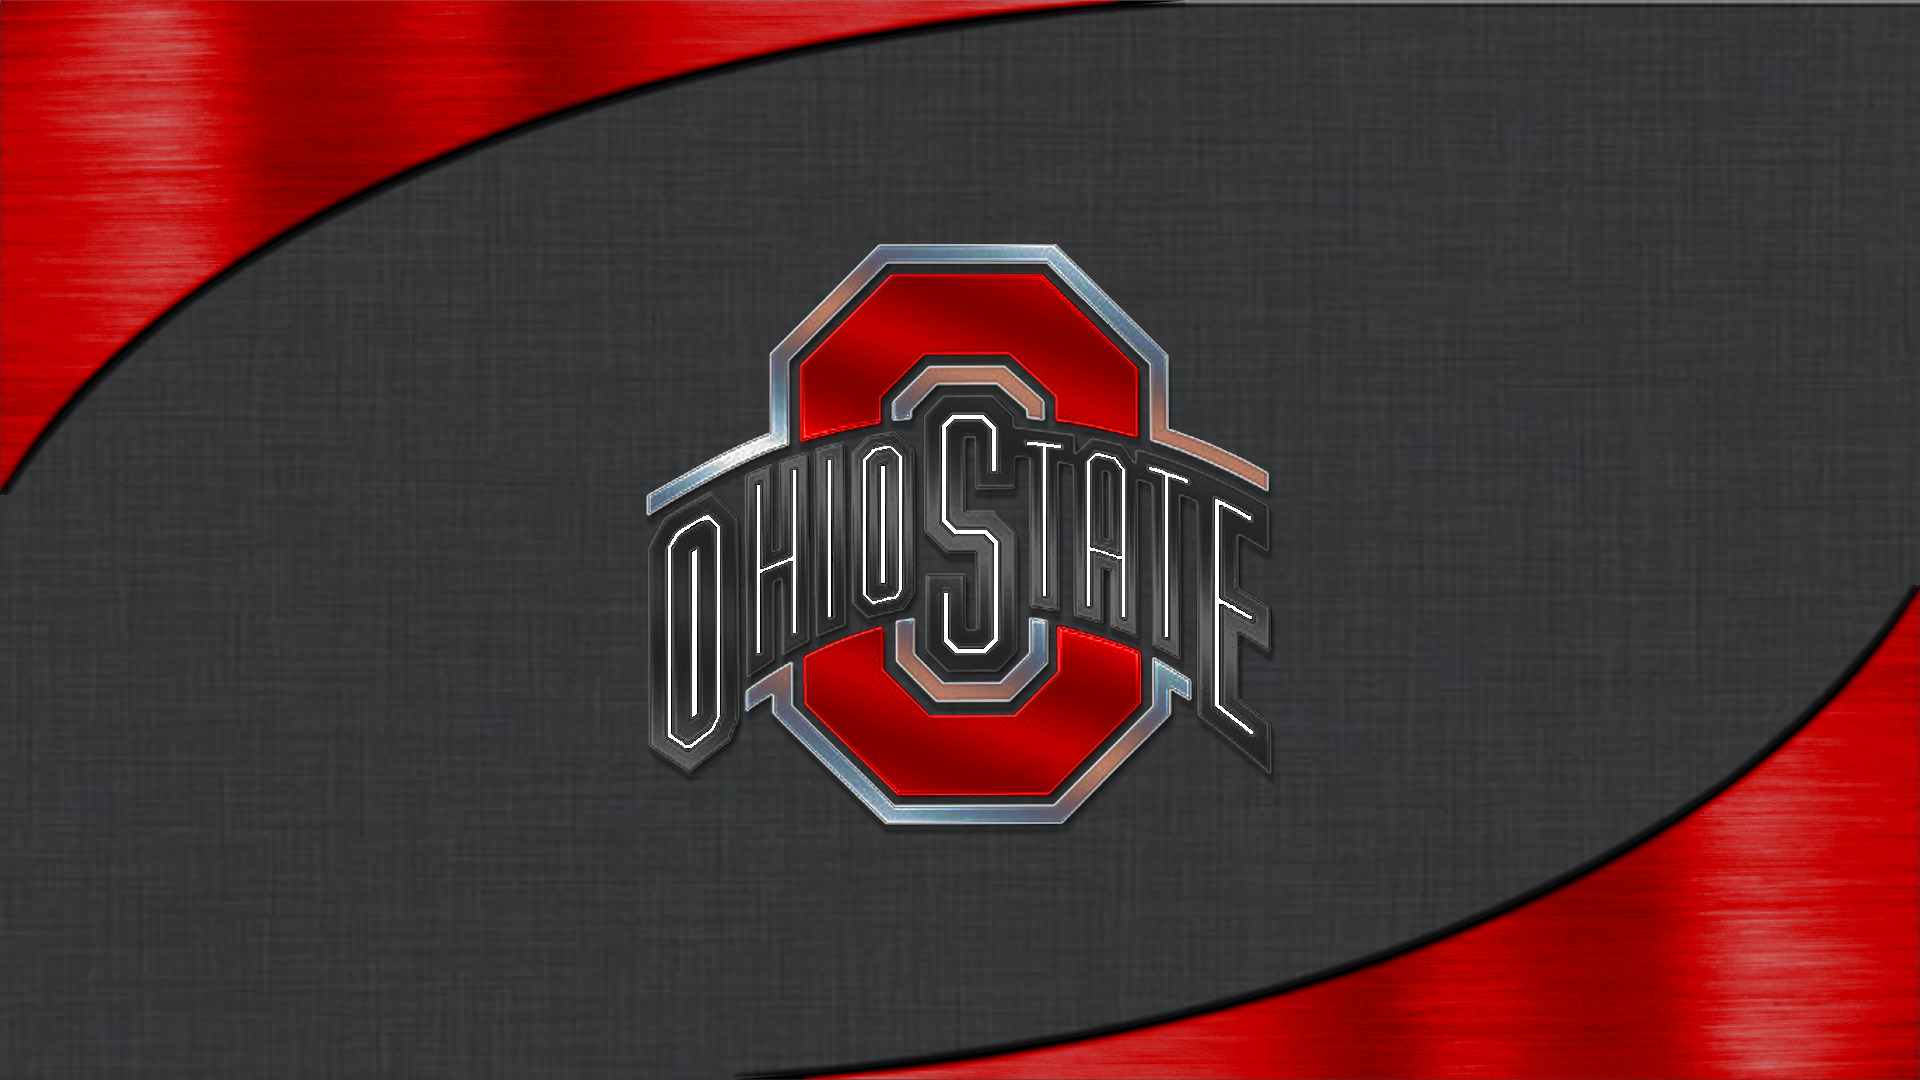 OSU Wallpaper 650 - Ohio State Football Wallpaper (35112652) - Fanpop